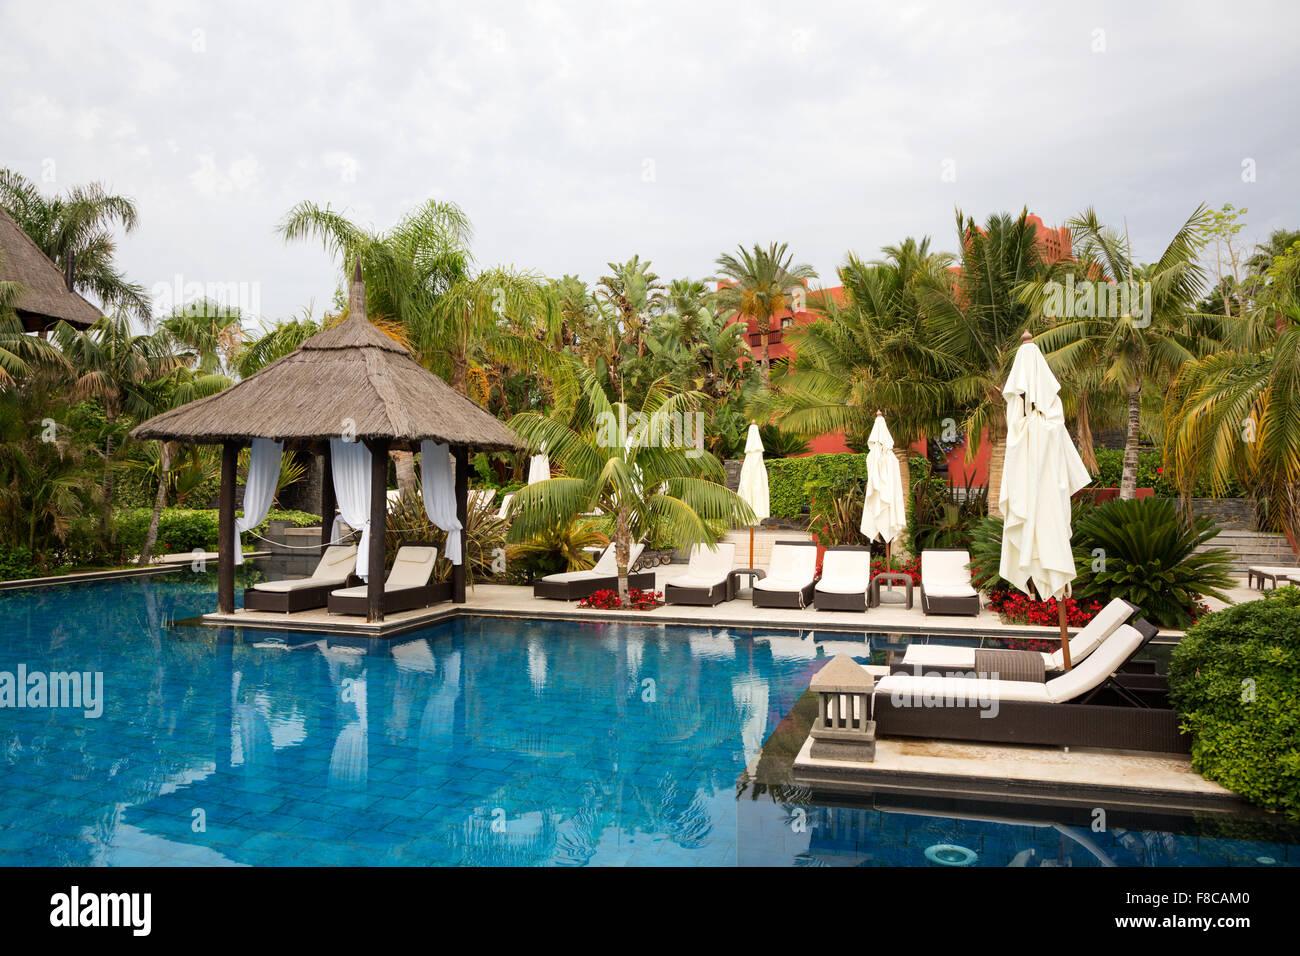 Spain benidorm pool stock photos spain benidorm pool - Hotels in alicante with swimming pool ...